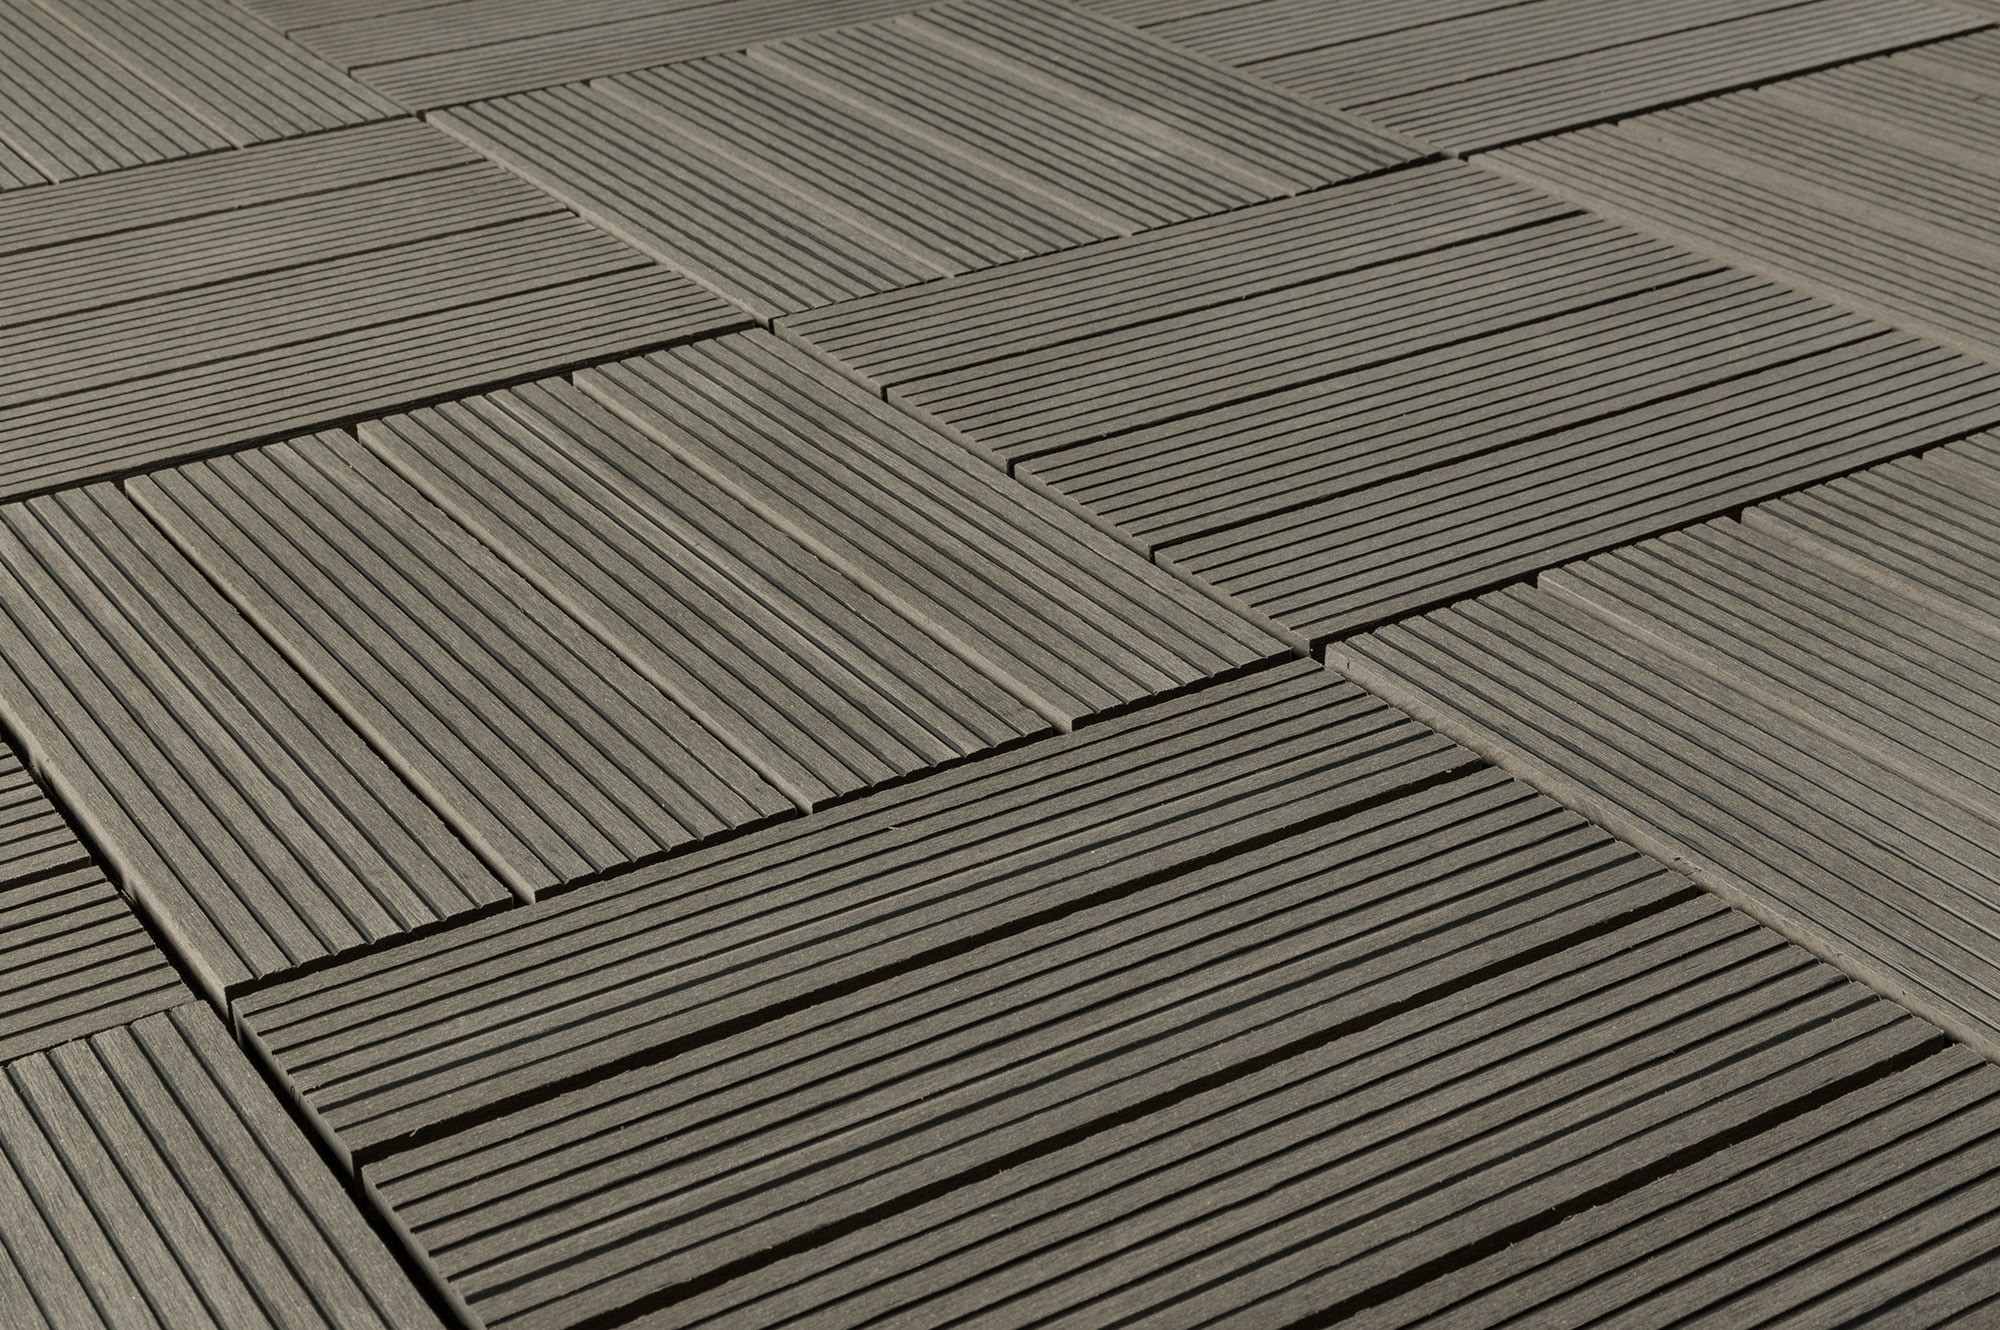 Kontiki composite interlocking deck tiles classic 25 year gray 12 x12 x15 16 - How to install interlocking deck tiles ...